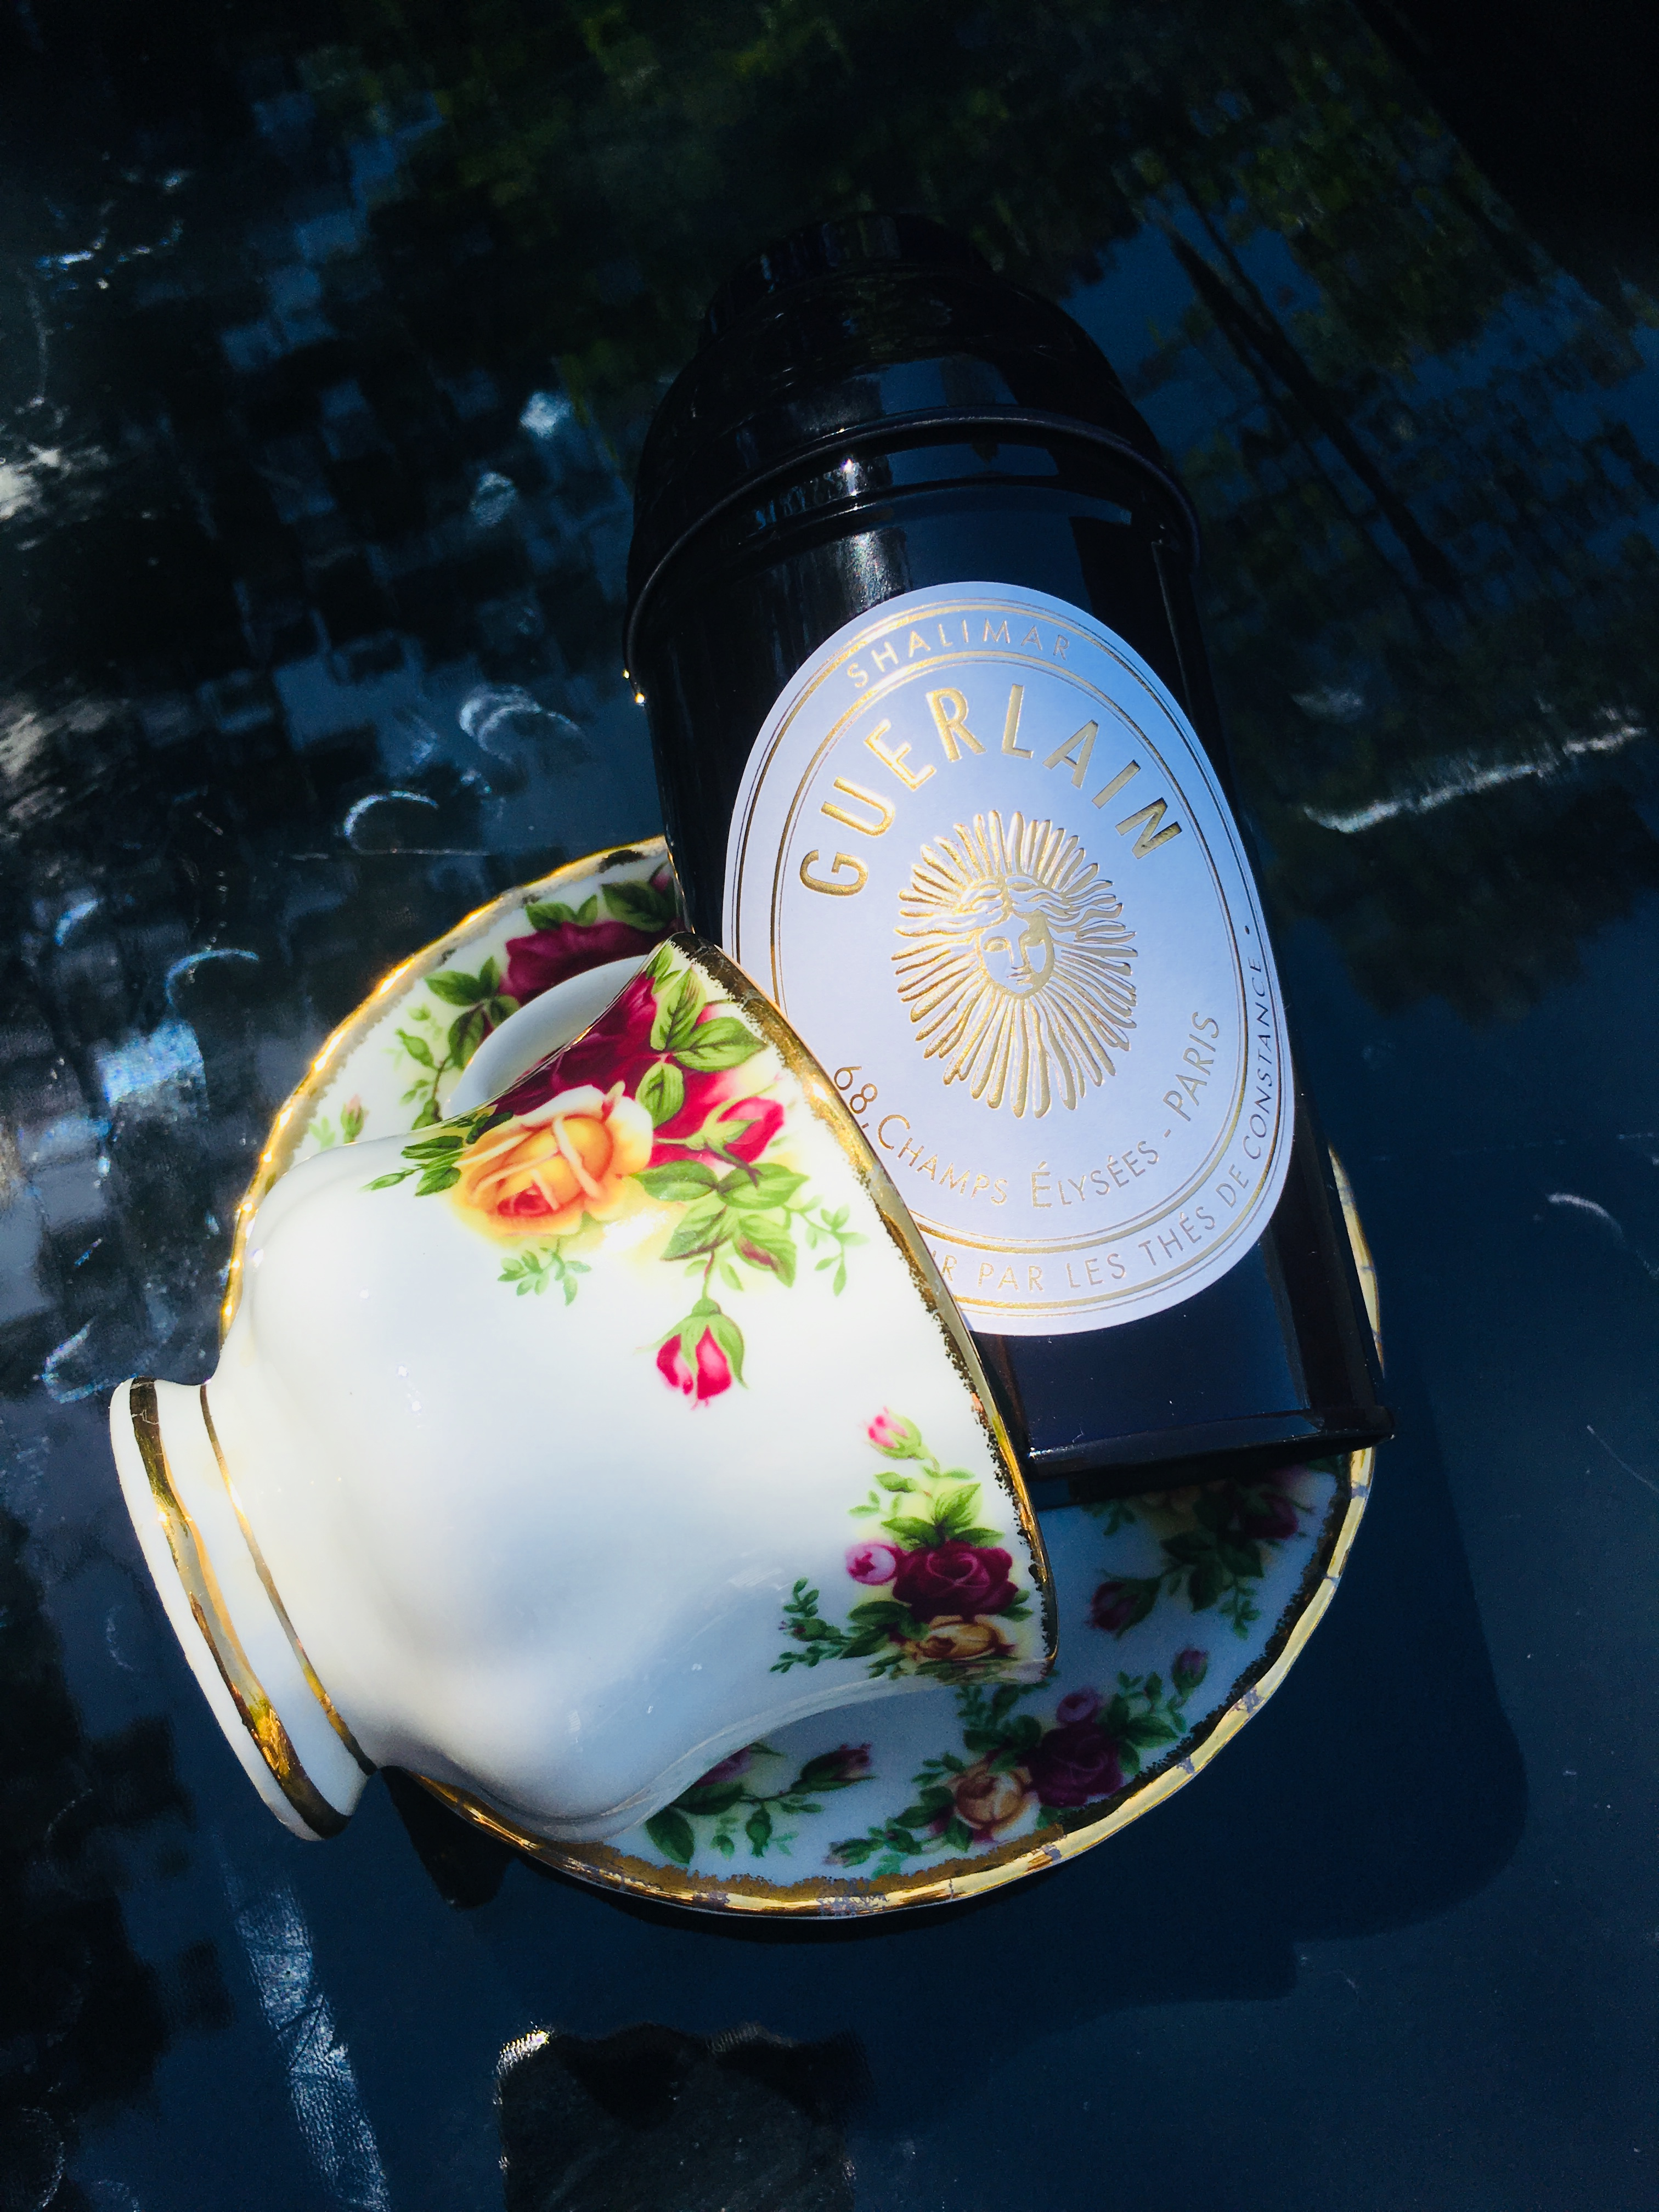 Guerlain Shalimar Tea